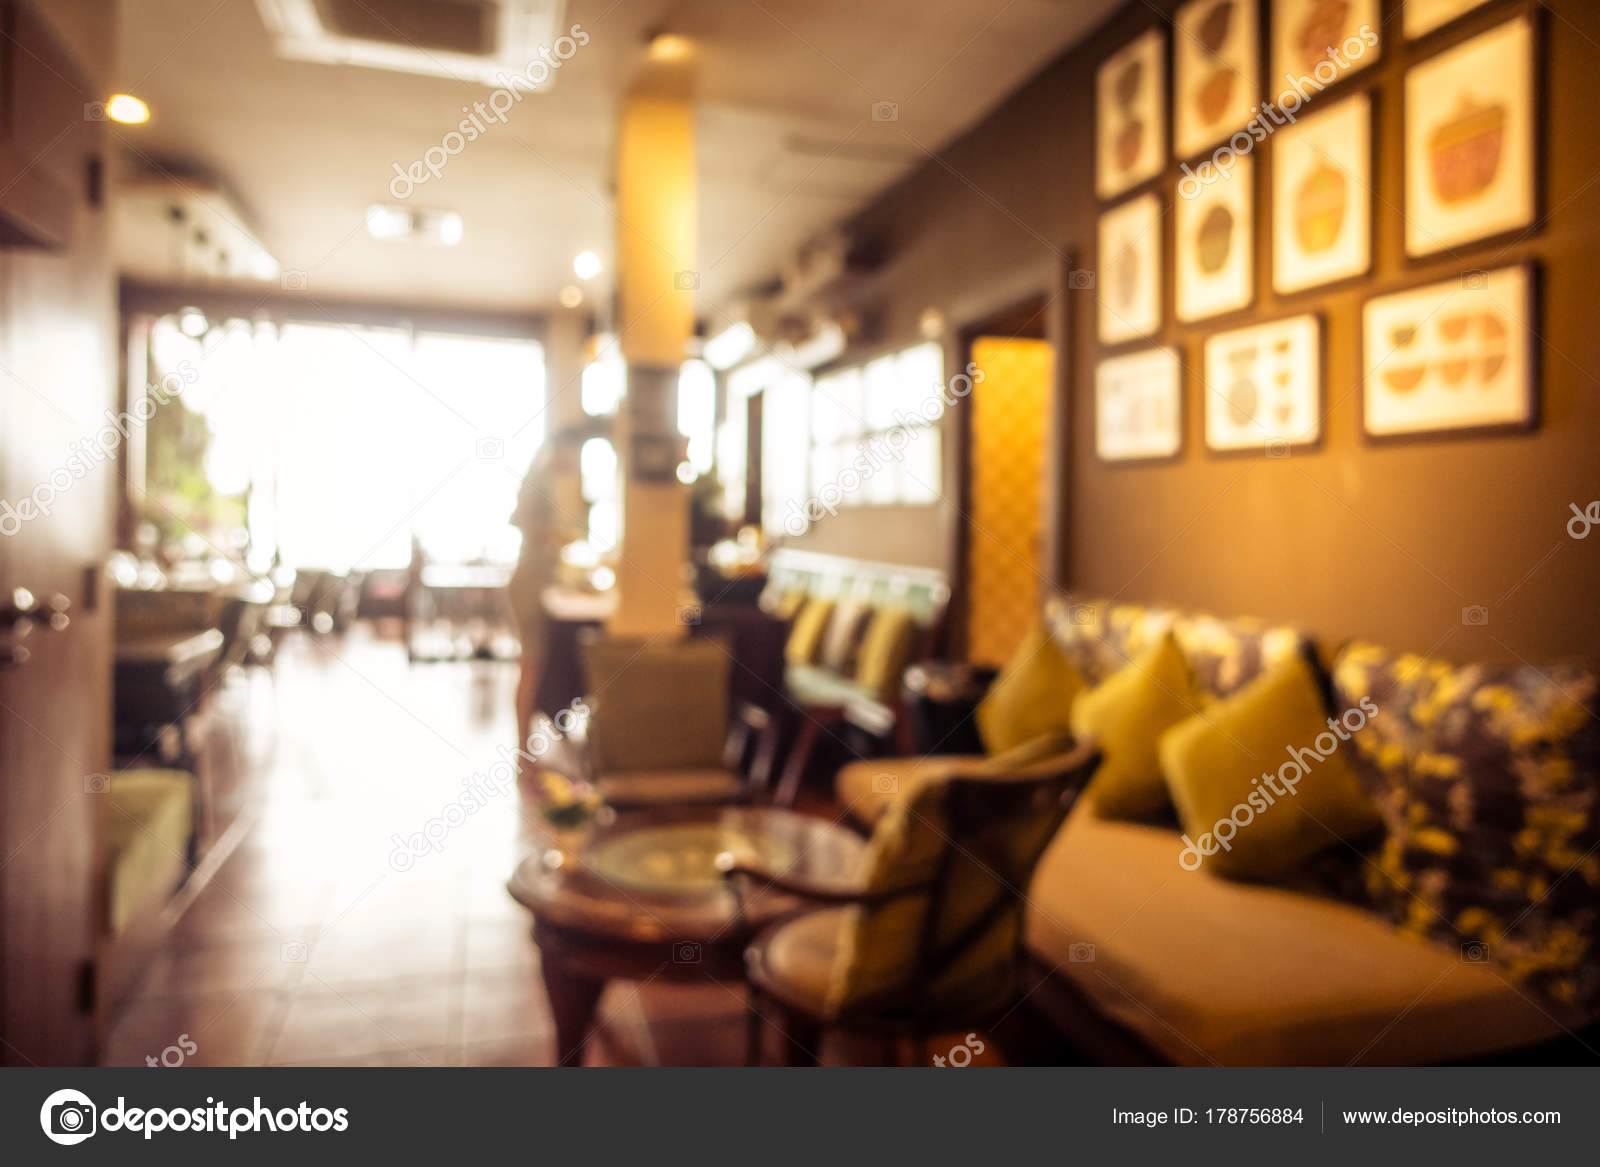 Abstract Blur Coffee Shop Cafe Restaurant Interior Background Vintage Filter Stock Photo C Mrsiraphol 178756884